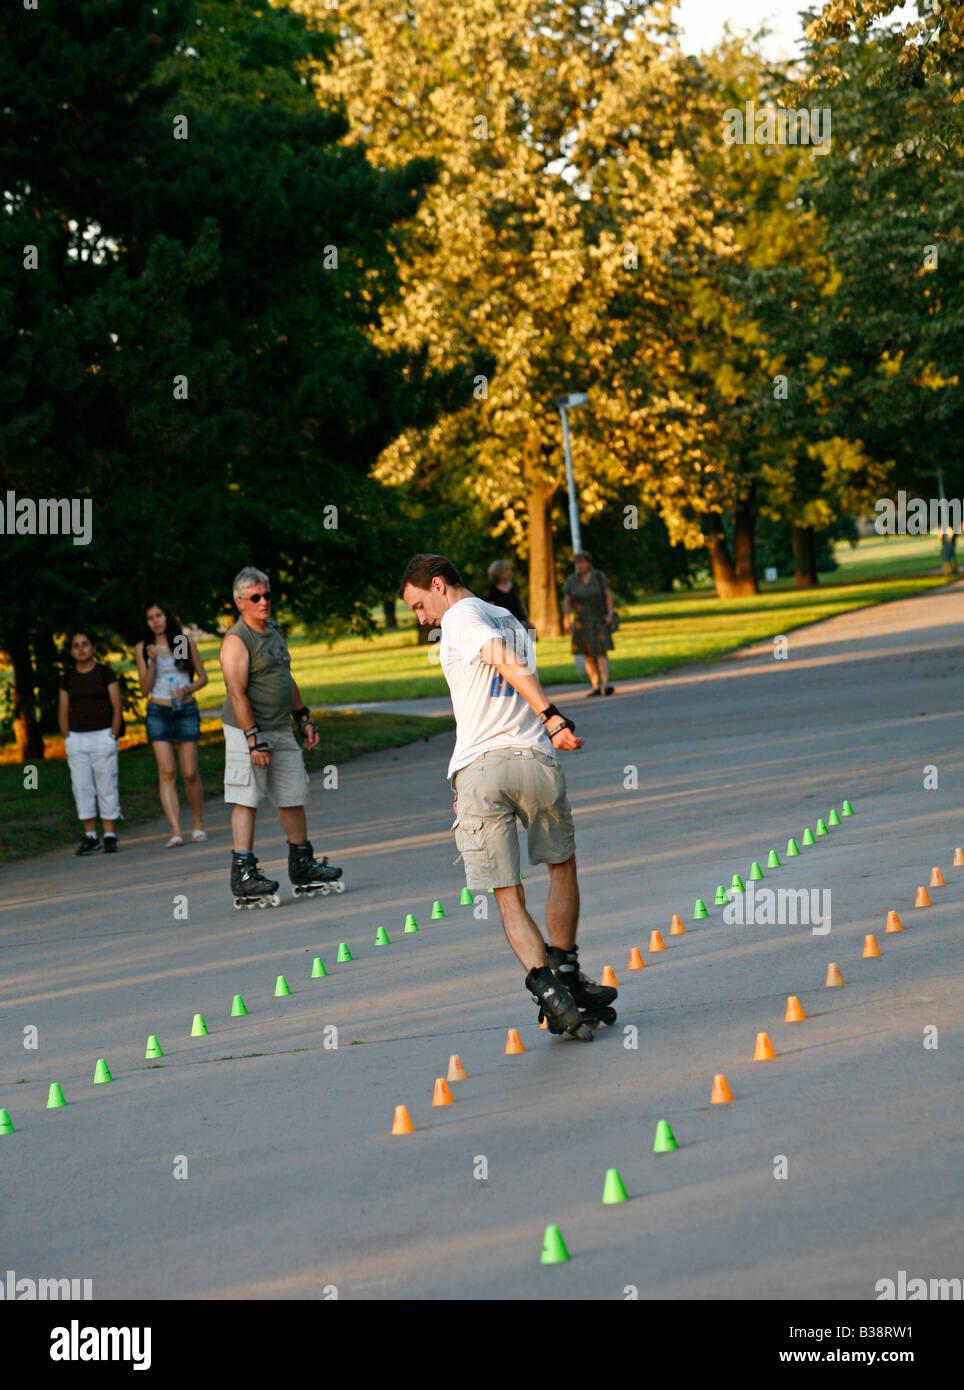 Aug 2008 - People Skating at Letna Park Prague Czech Republic - Stock Image